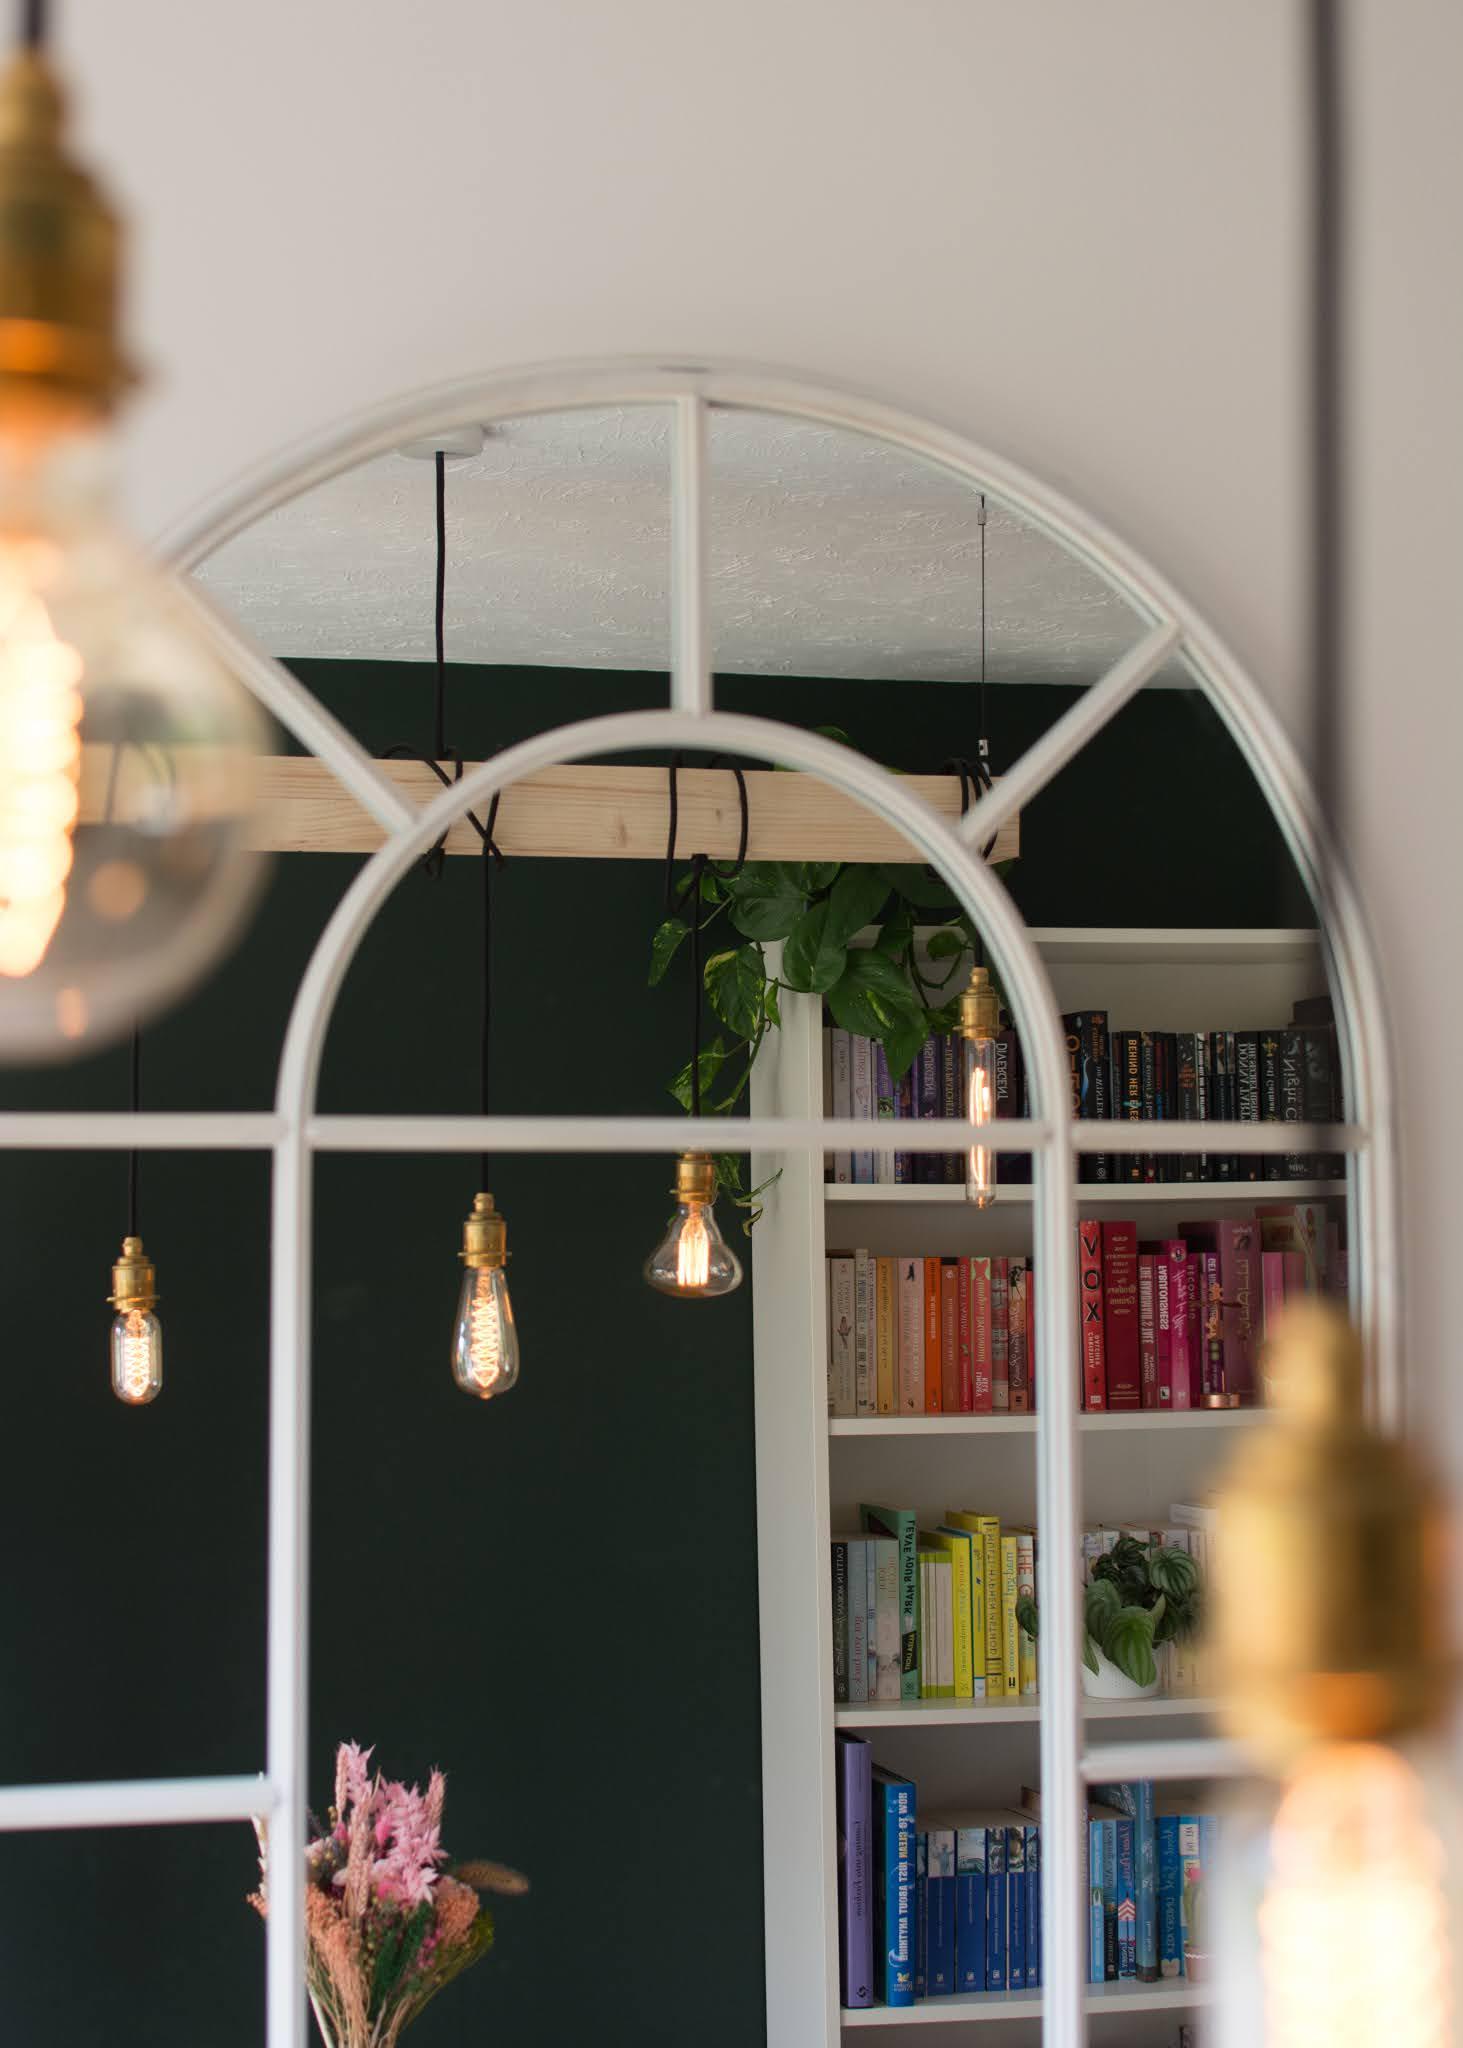 Hanging Wooden beam light